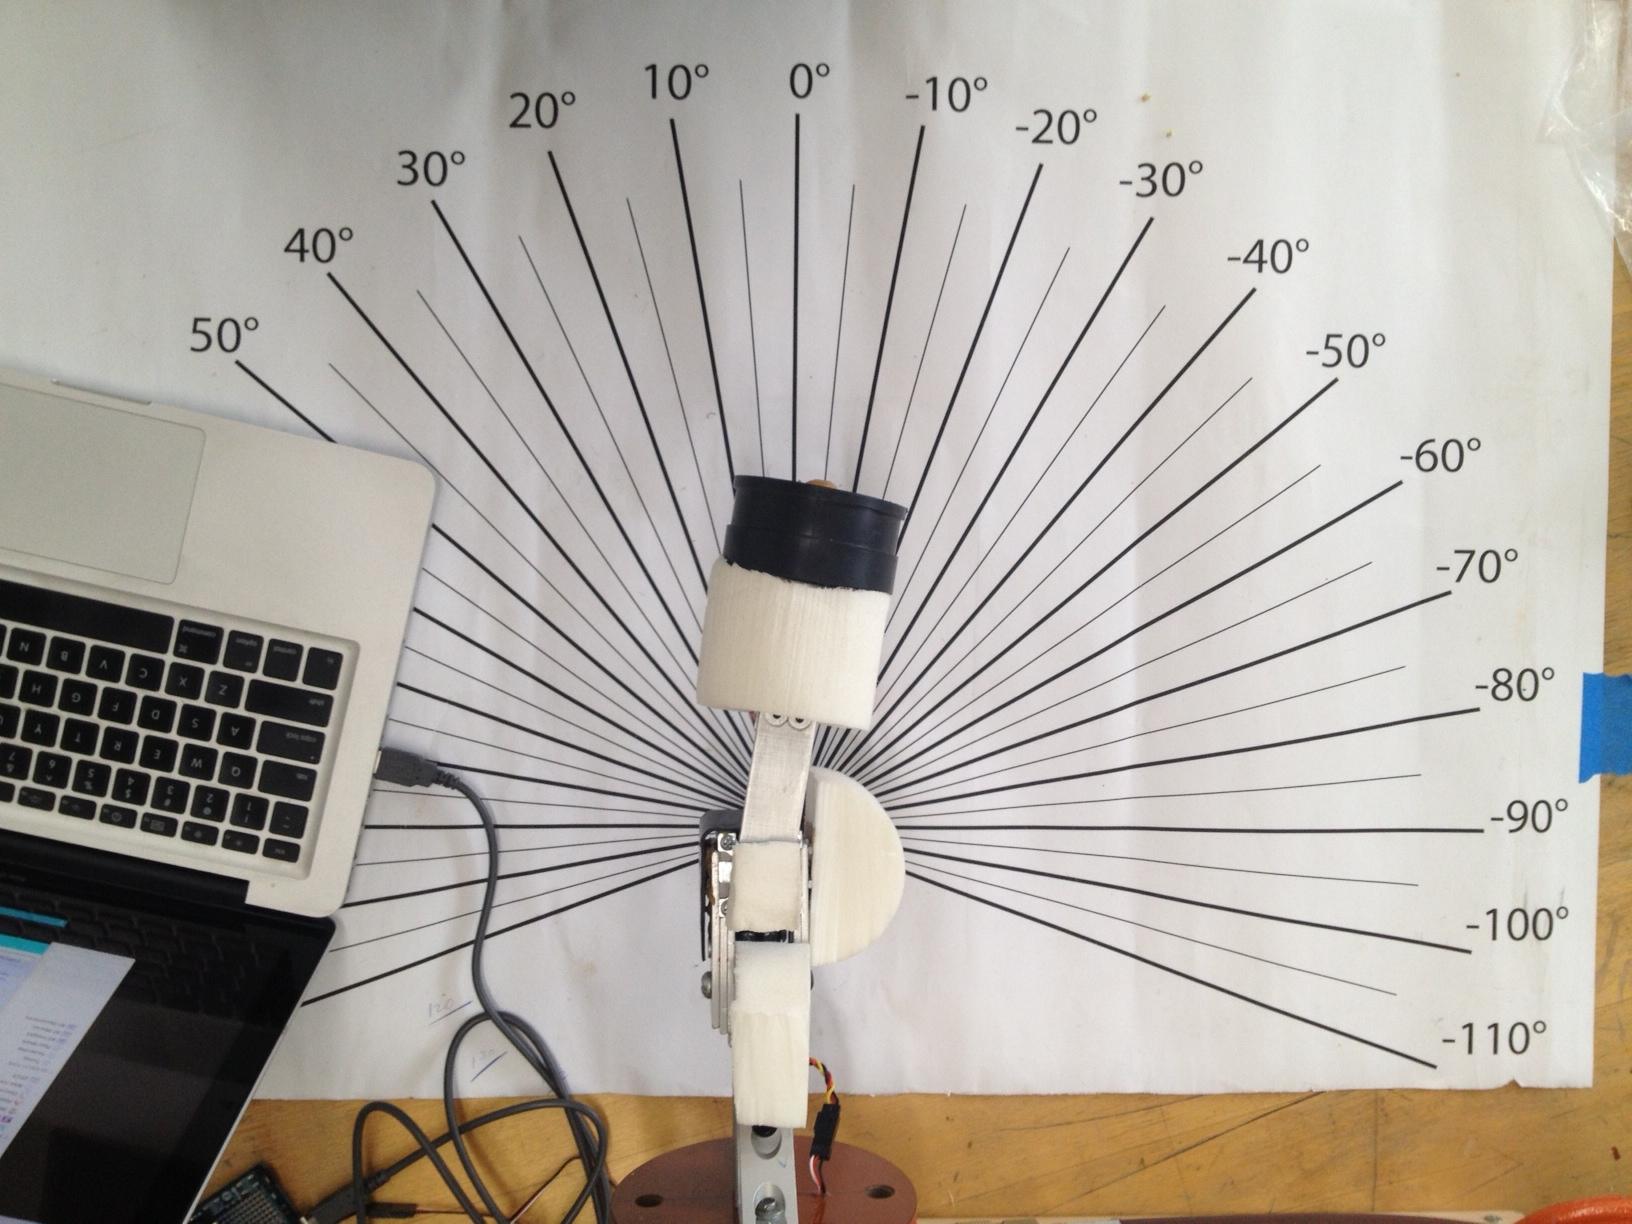 Range of motion testing